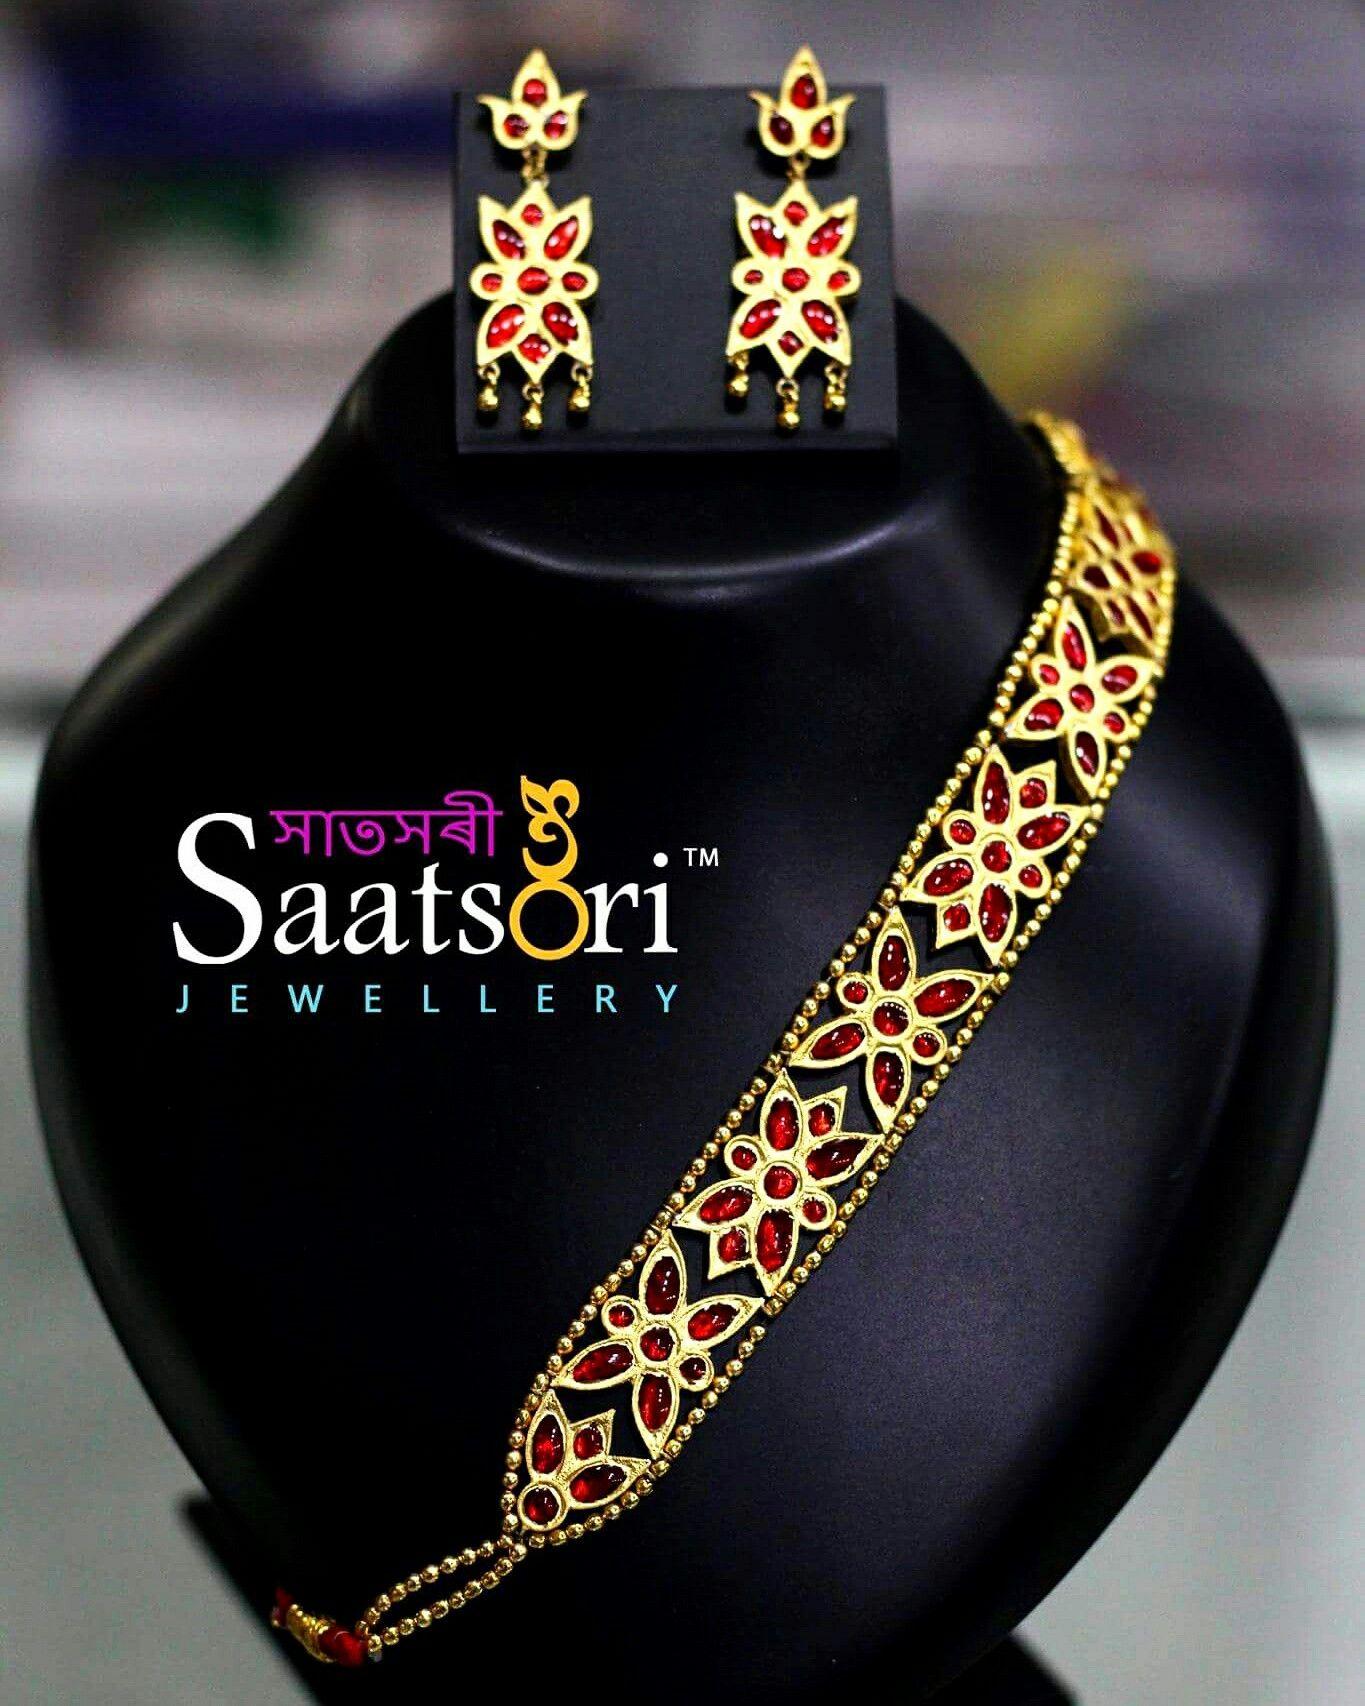 Assamese Jewellery Bridal jewelry, Jewelry, Jewelry design